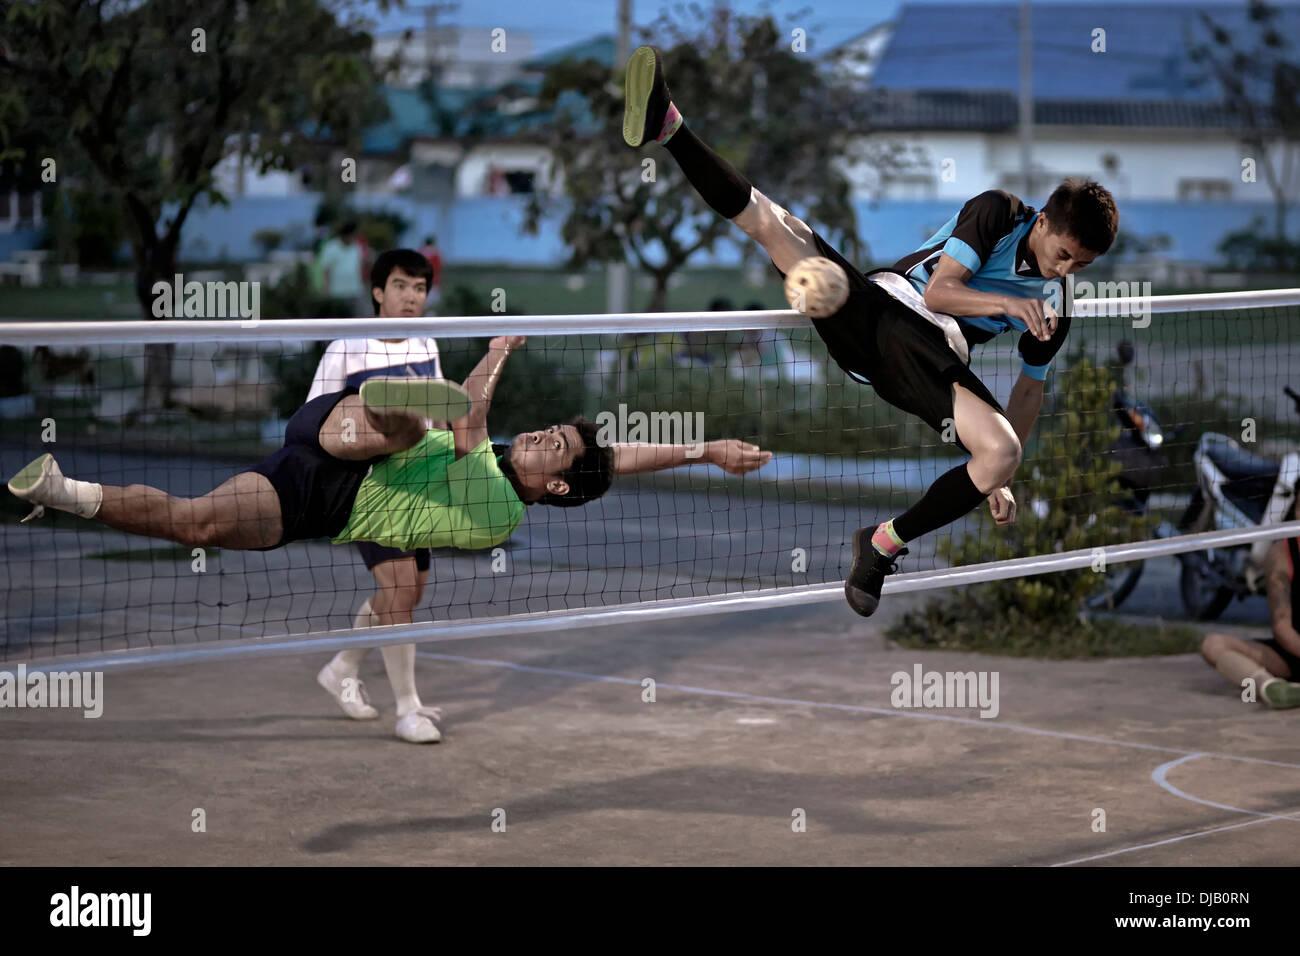 Atletismo extrema durante un juego de Sepak Takraw. Tailandés tradicional y popular juego de fútbol. Tailandia S. E. Asia Imagen De Stock